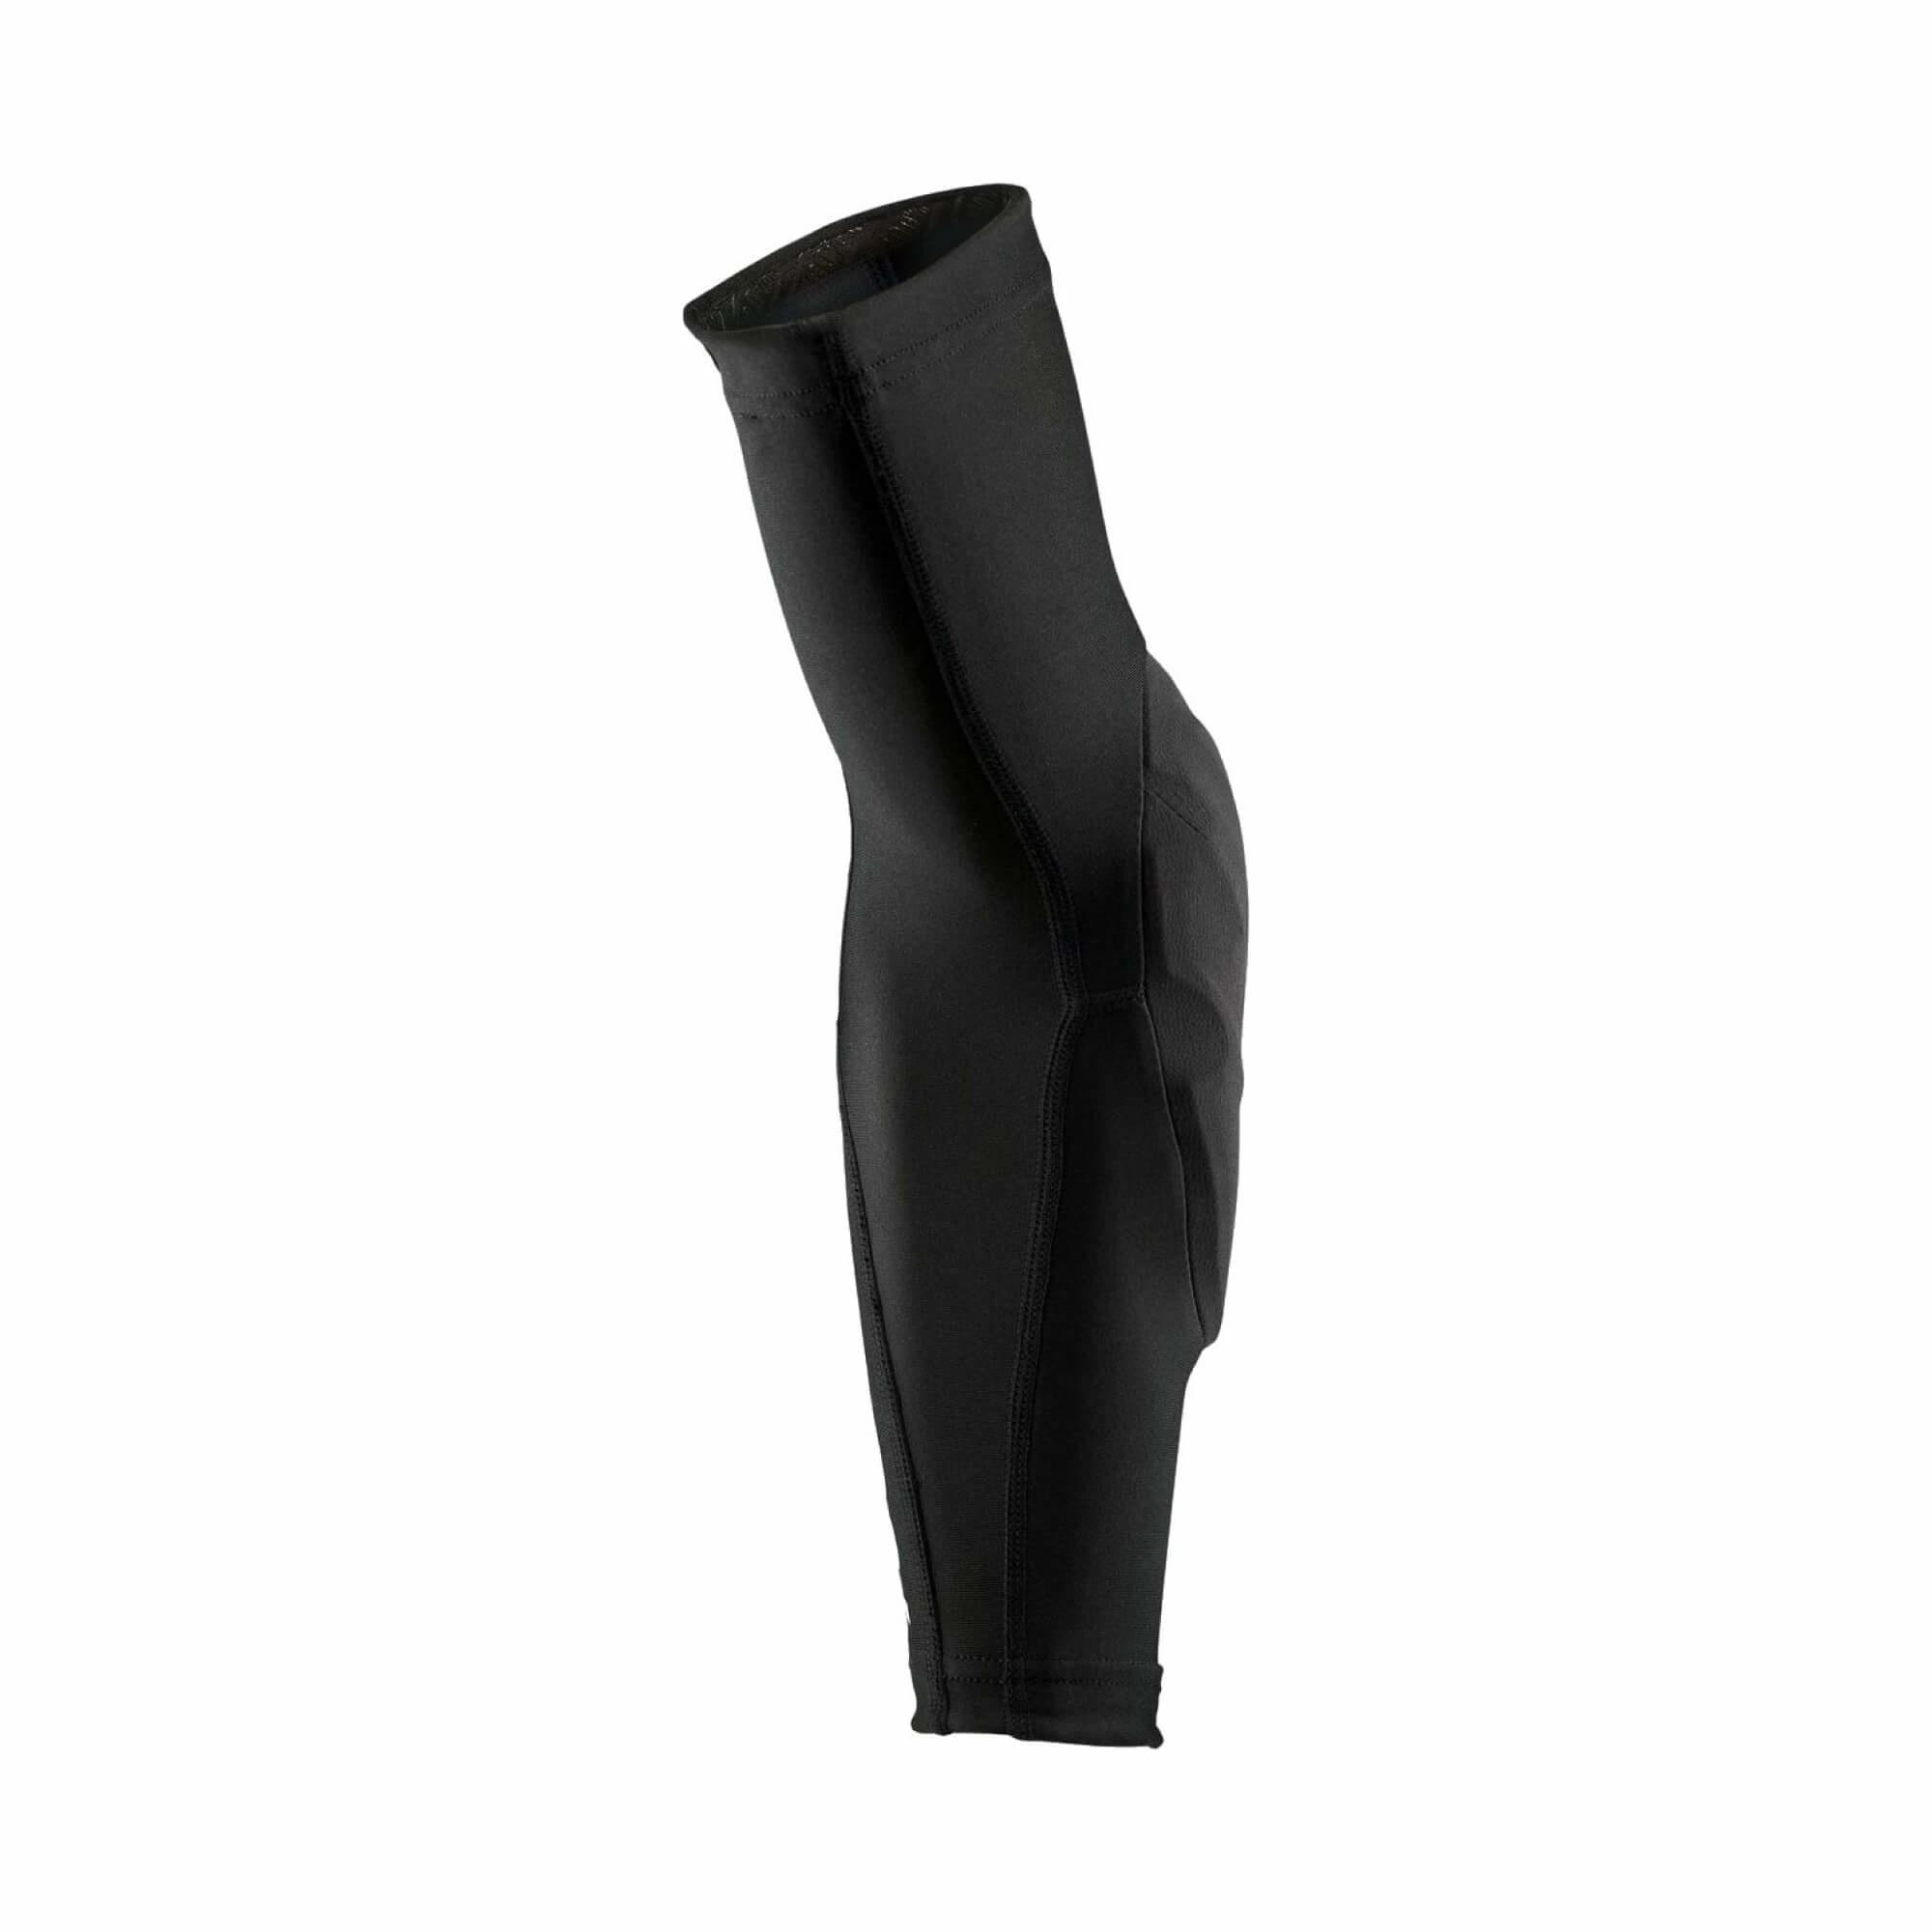 Teratec Plus Elbow Guard 2021-2